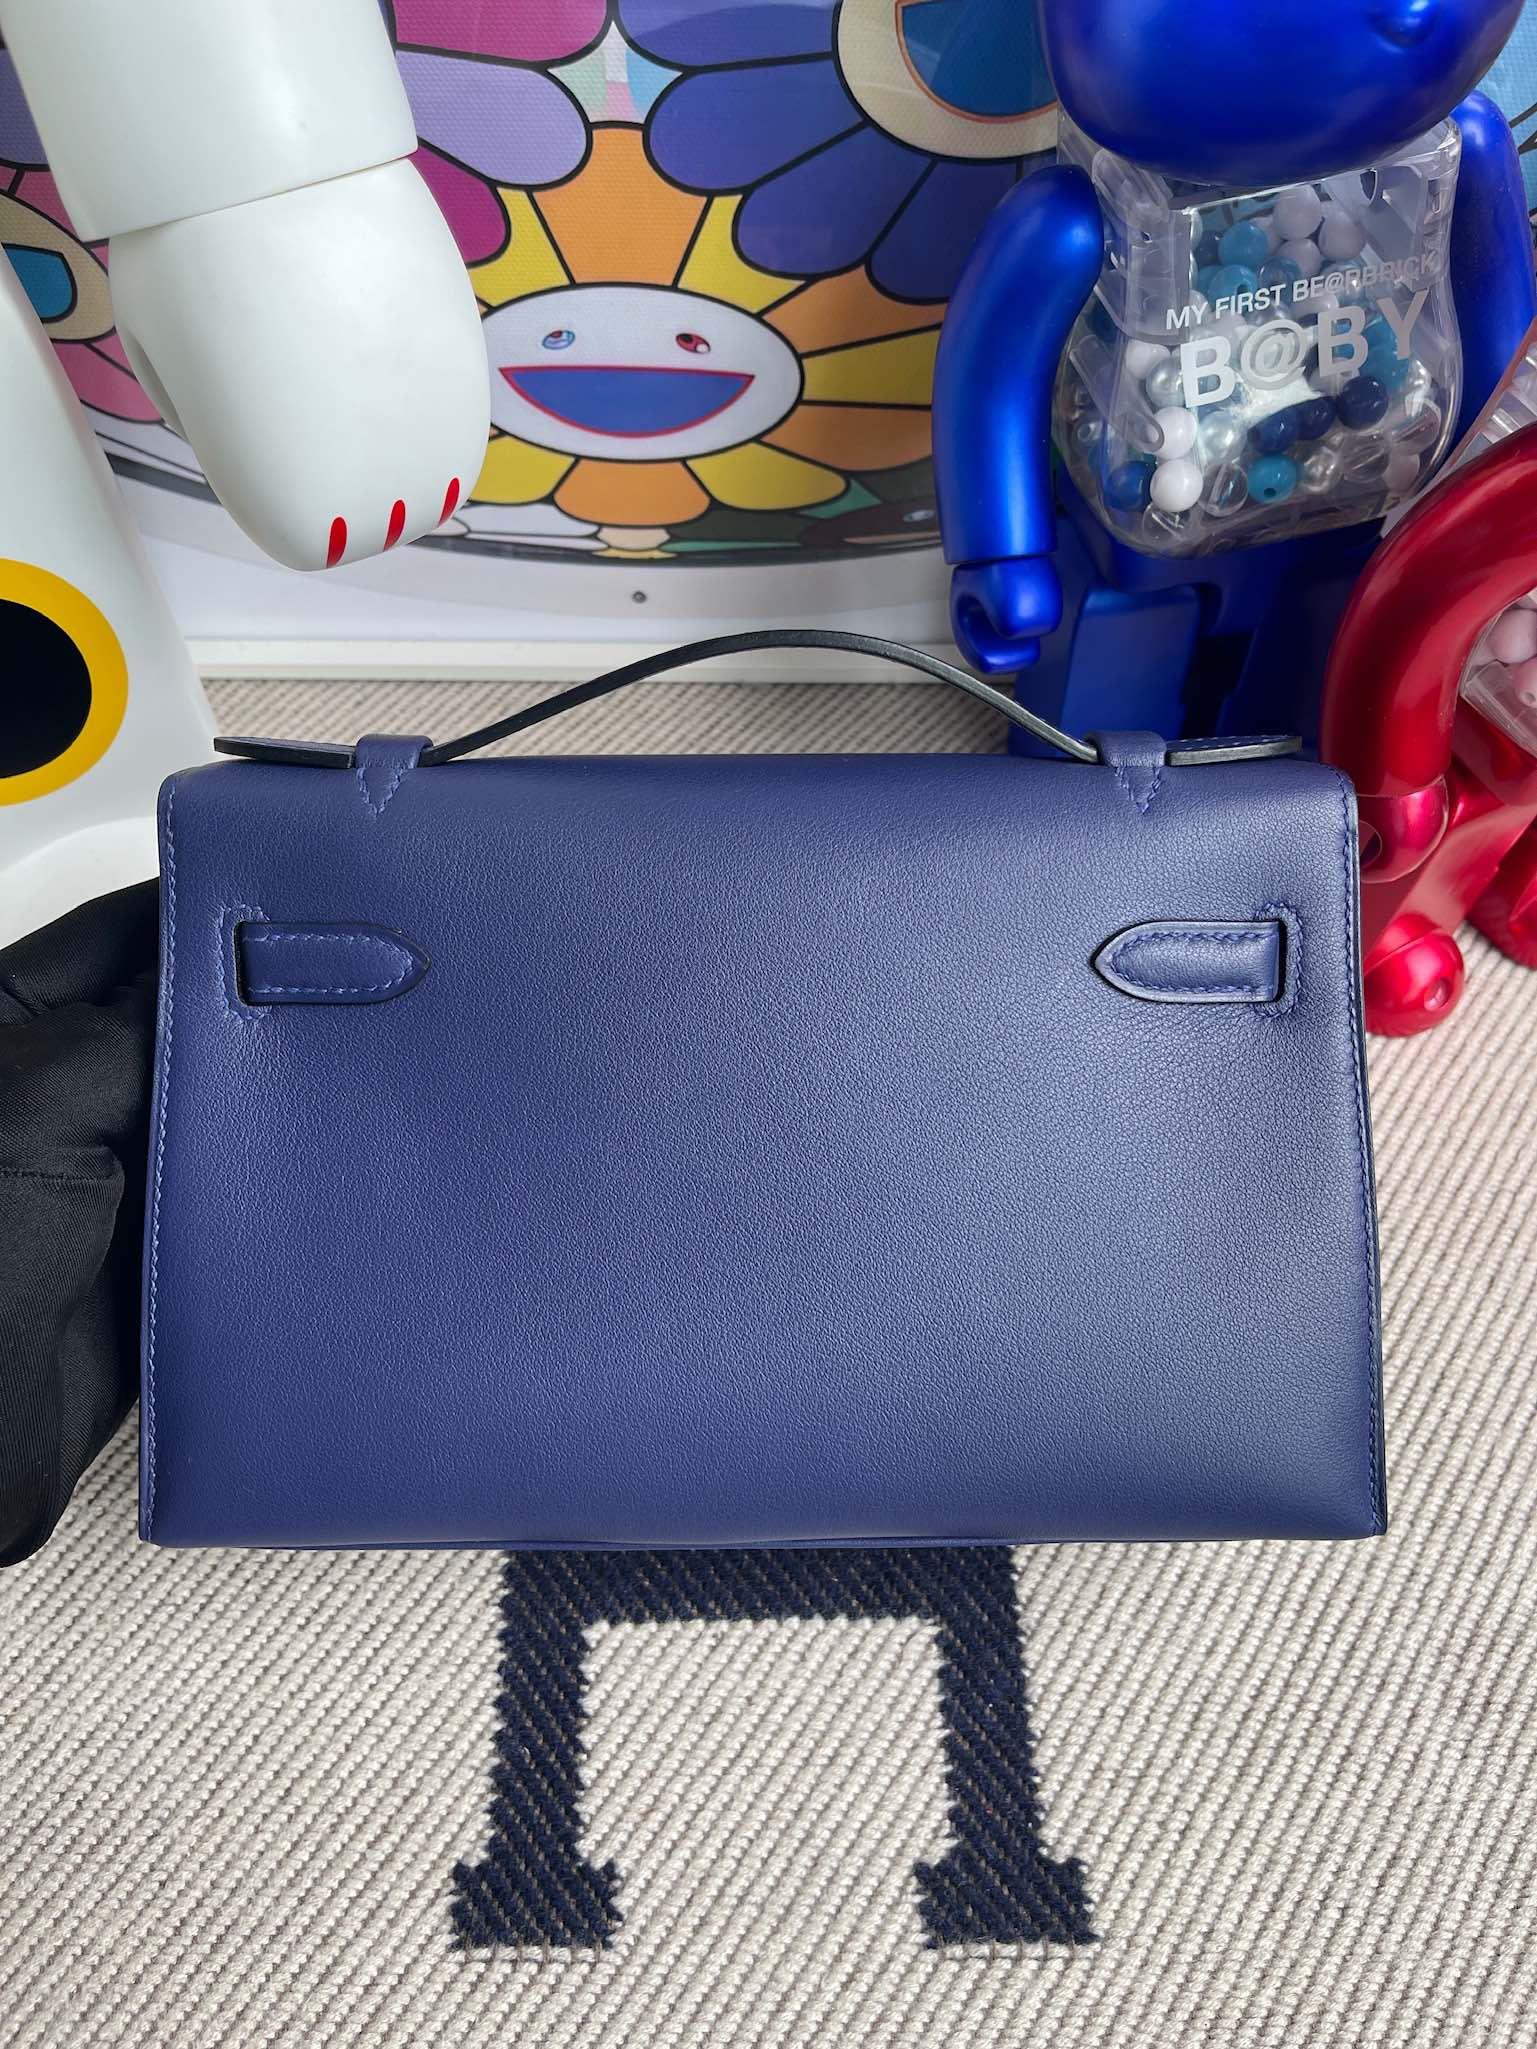 Hermès(爱马仕)Mini kelly pochette Swift M3 墨水蓝 金扣 22cm 顶级手缝